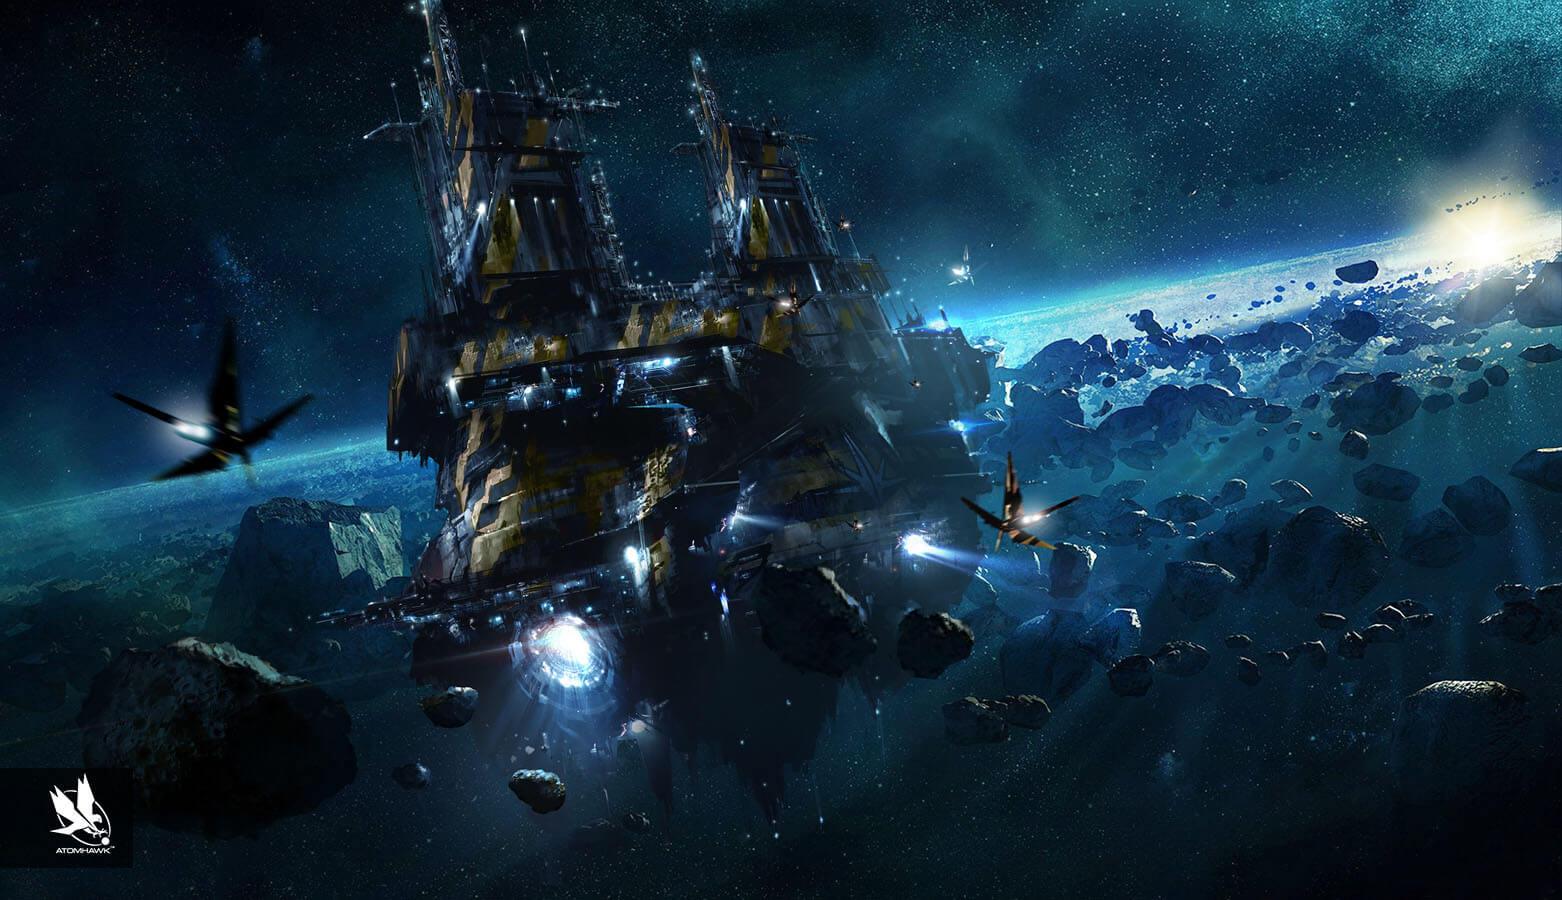 Atomhawk_Marvel_Guardians-of-the-Galaxy_Concept-Art_Environment-Design_Ky-ln-Exterior.jpg